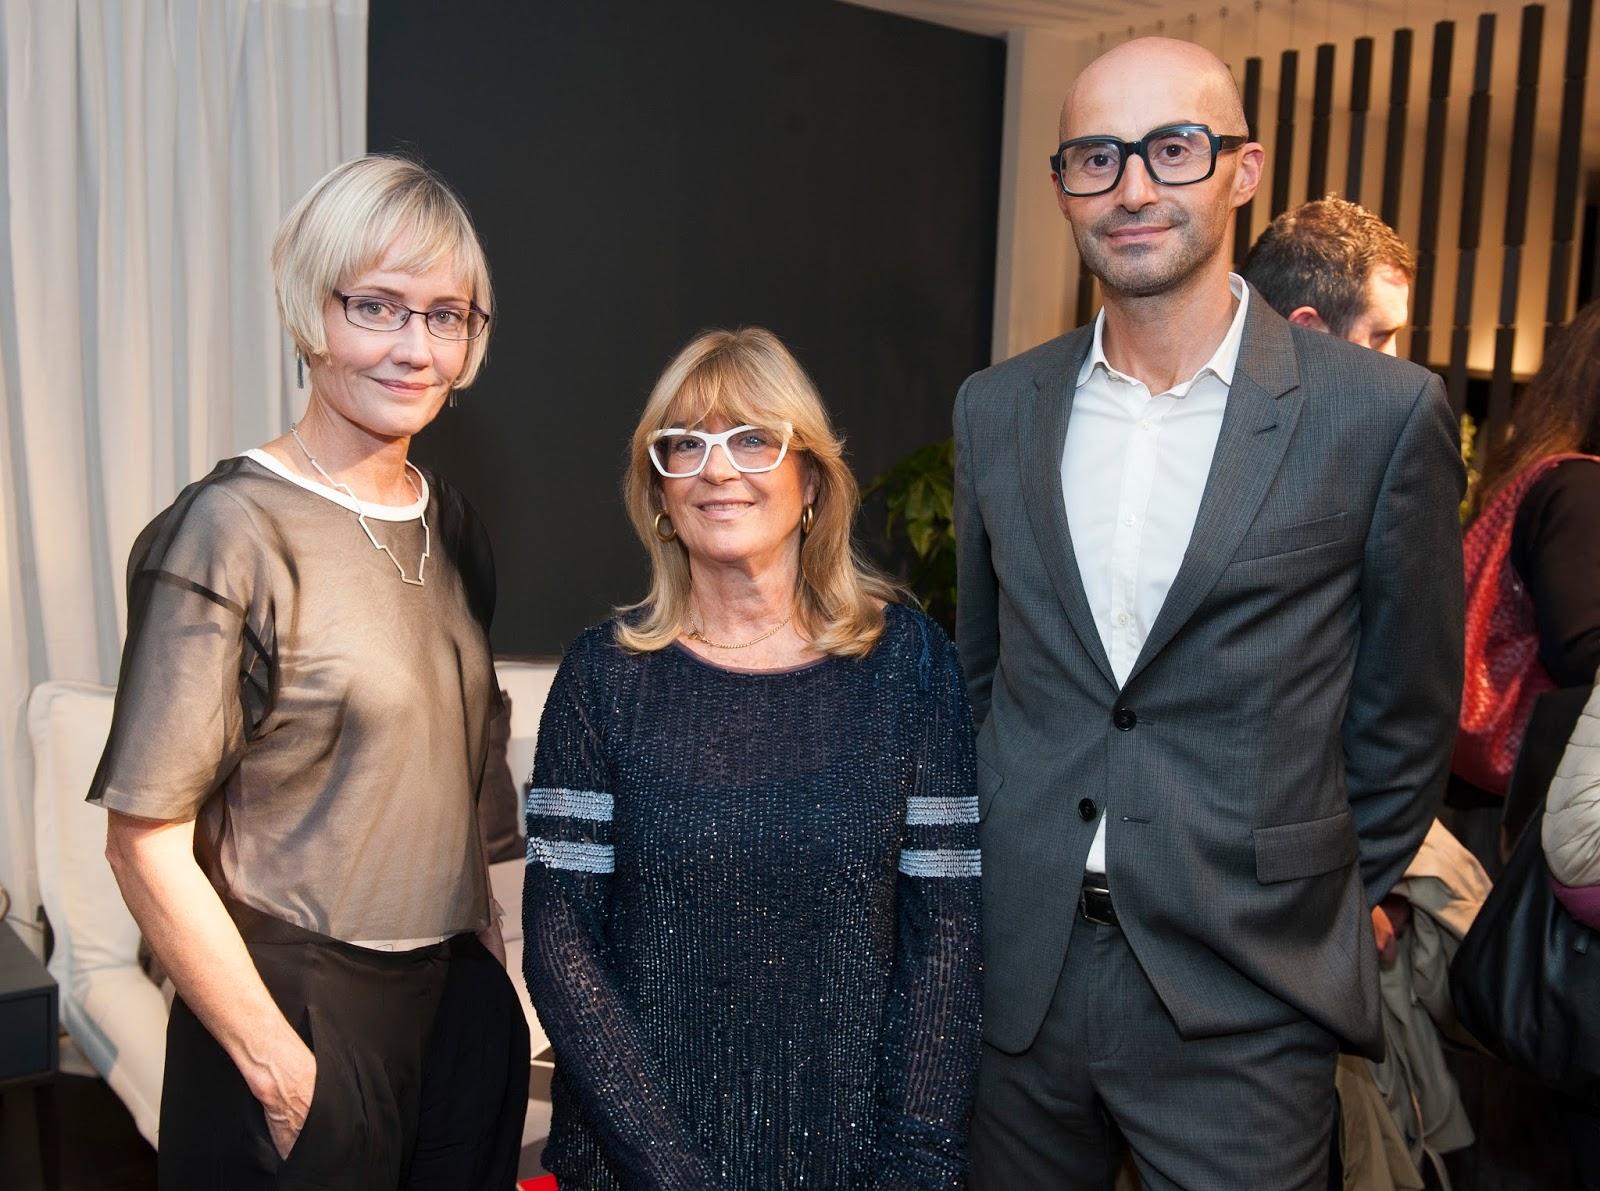 Alison Brooks with Gilda Bojardi and Michelangelo Giombini of INTERNI